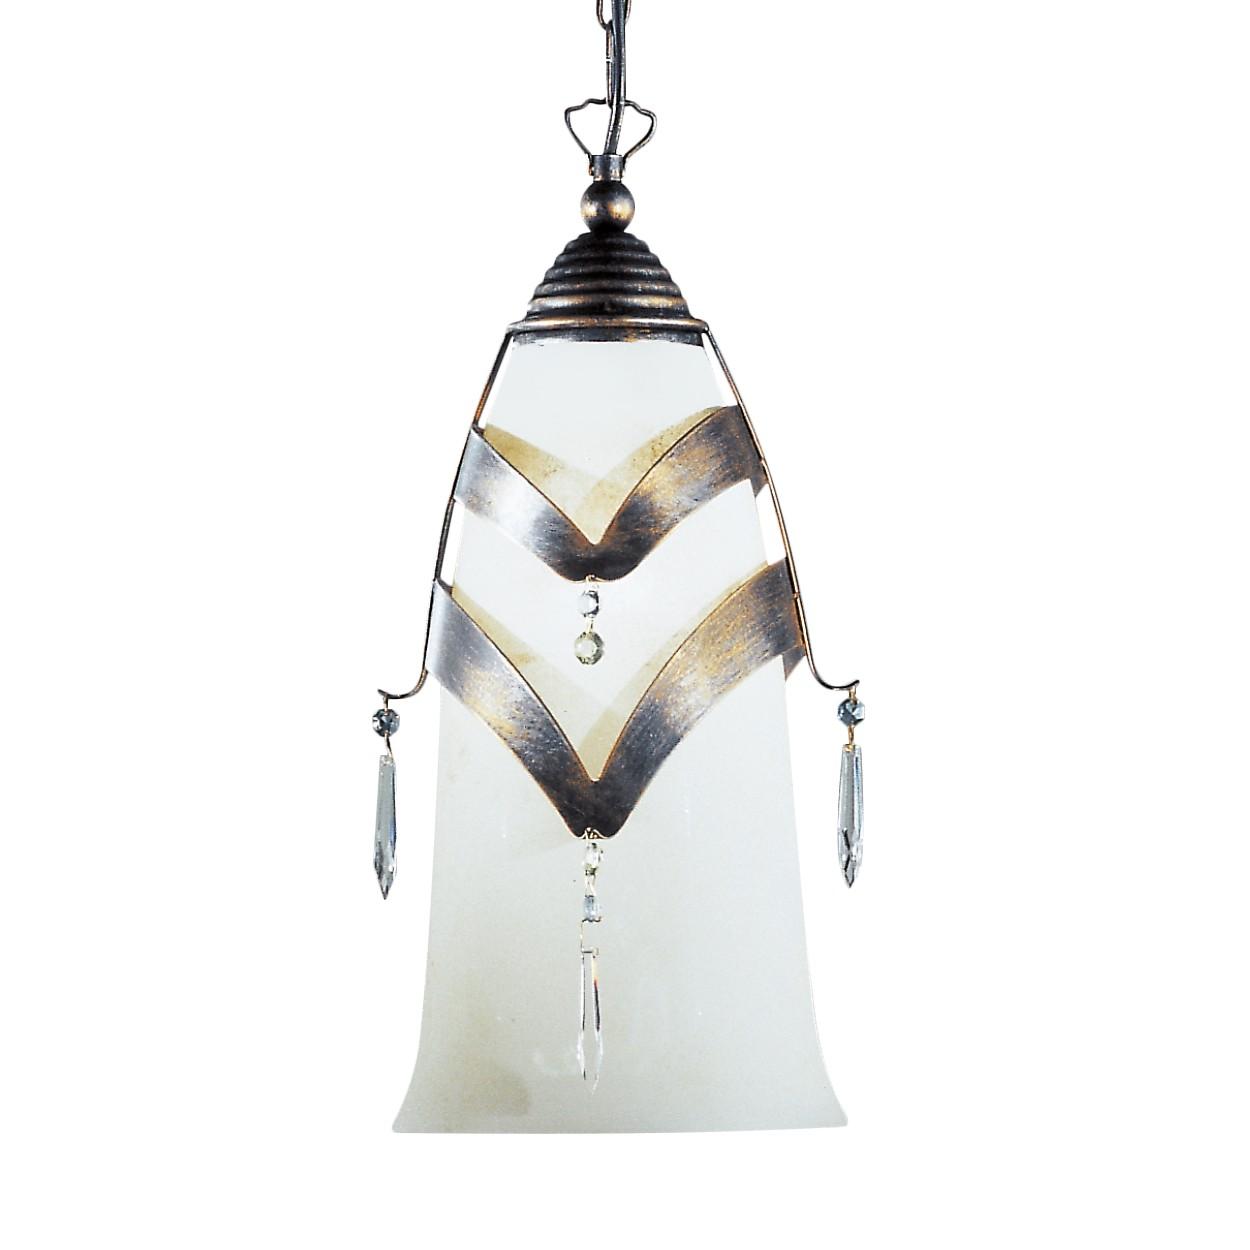 Pendelleuchte Prisma ● Metall/Glas ● Schwarz-Antik ● 1-flammig- Hans Kögl A+